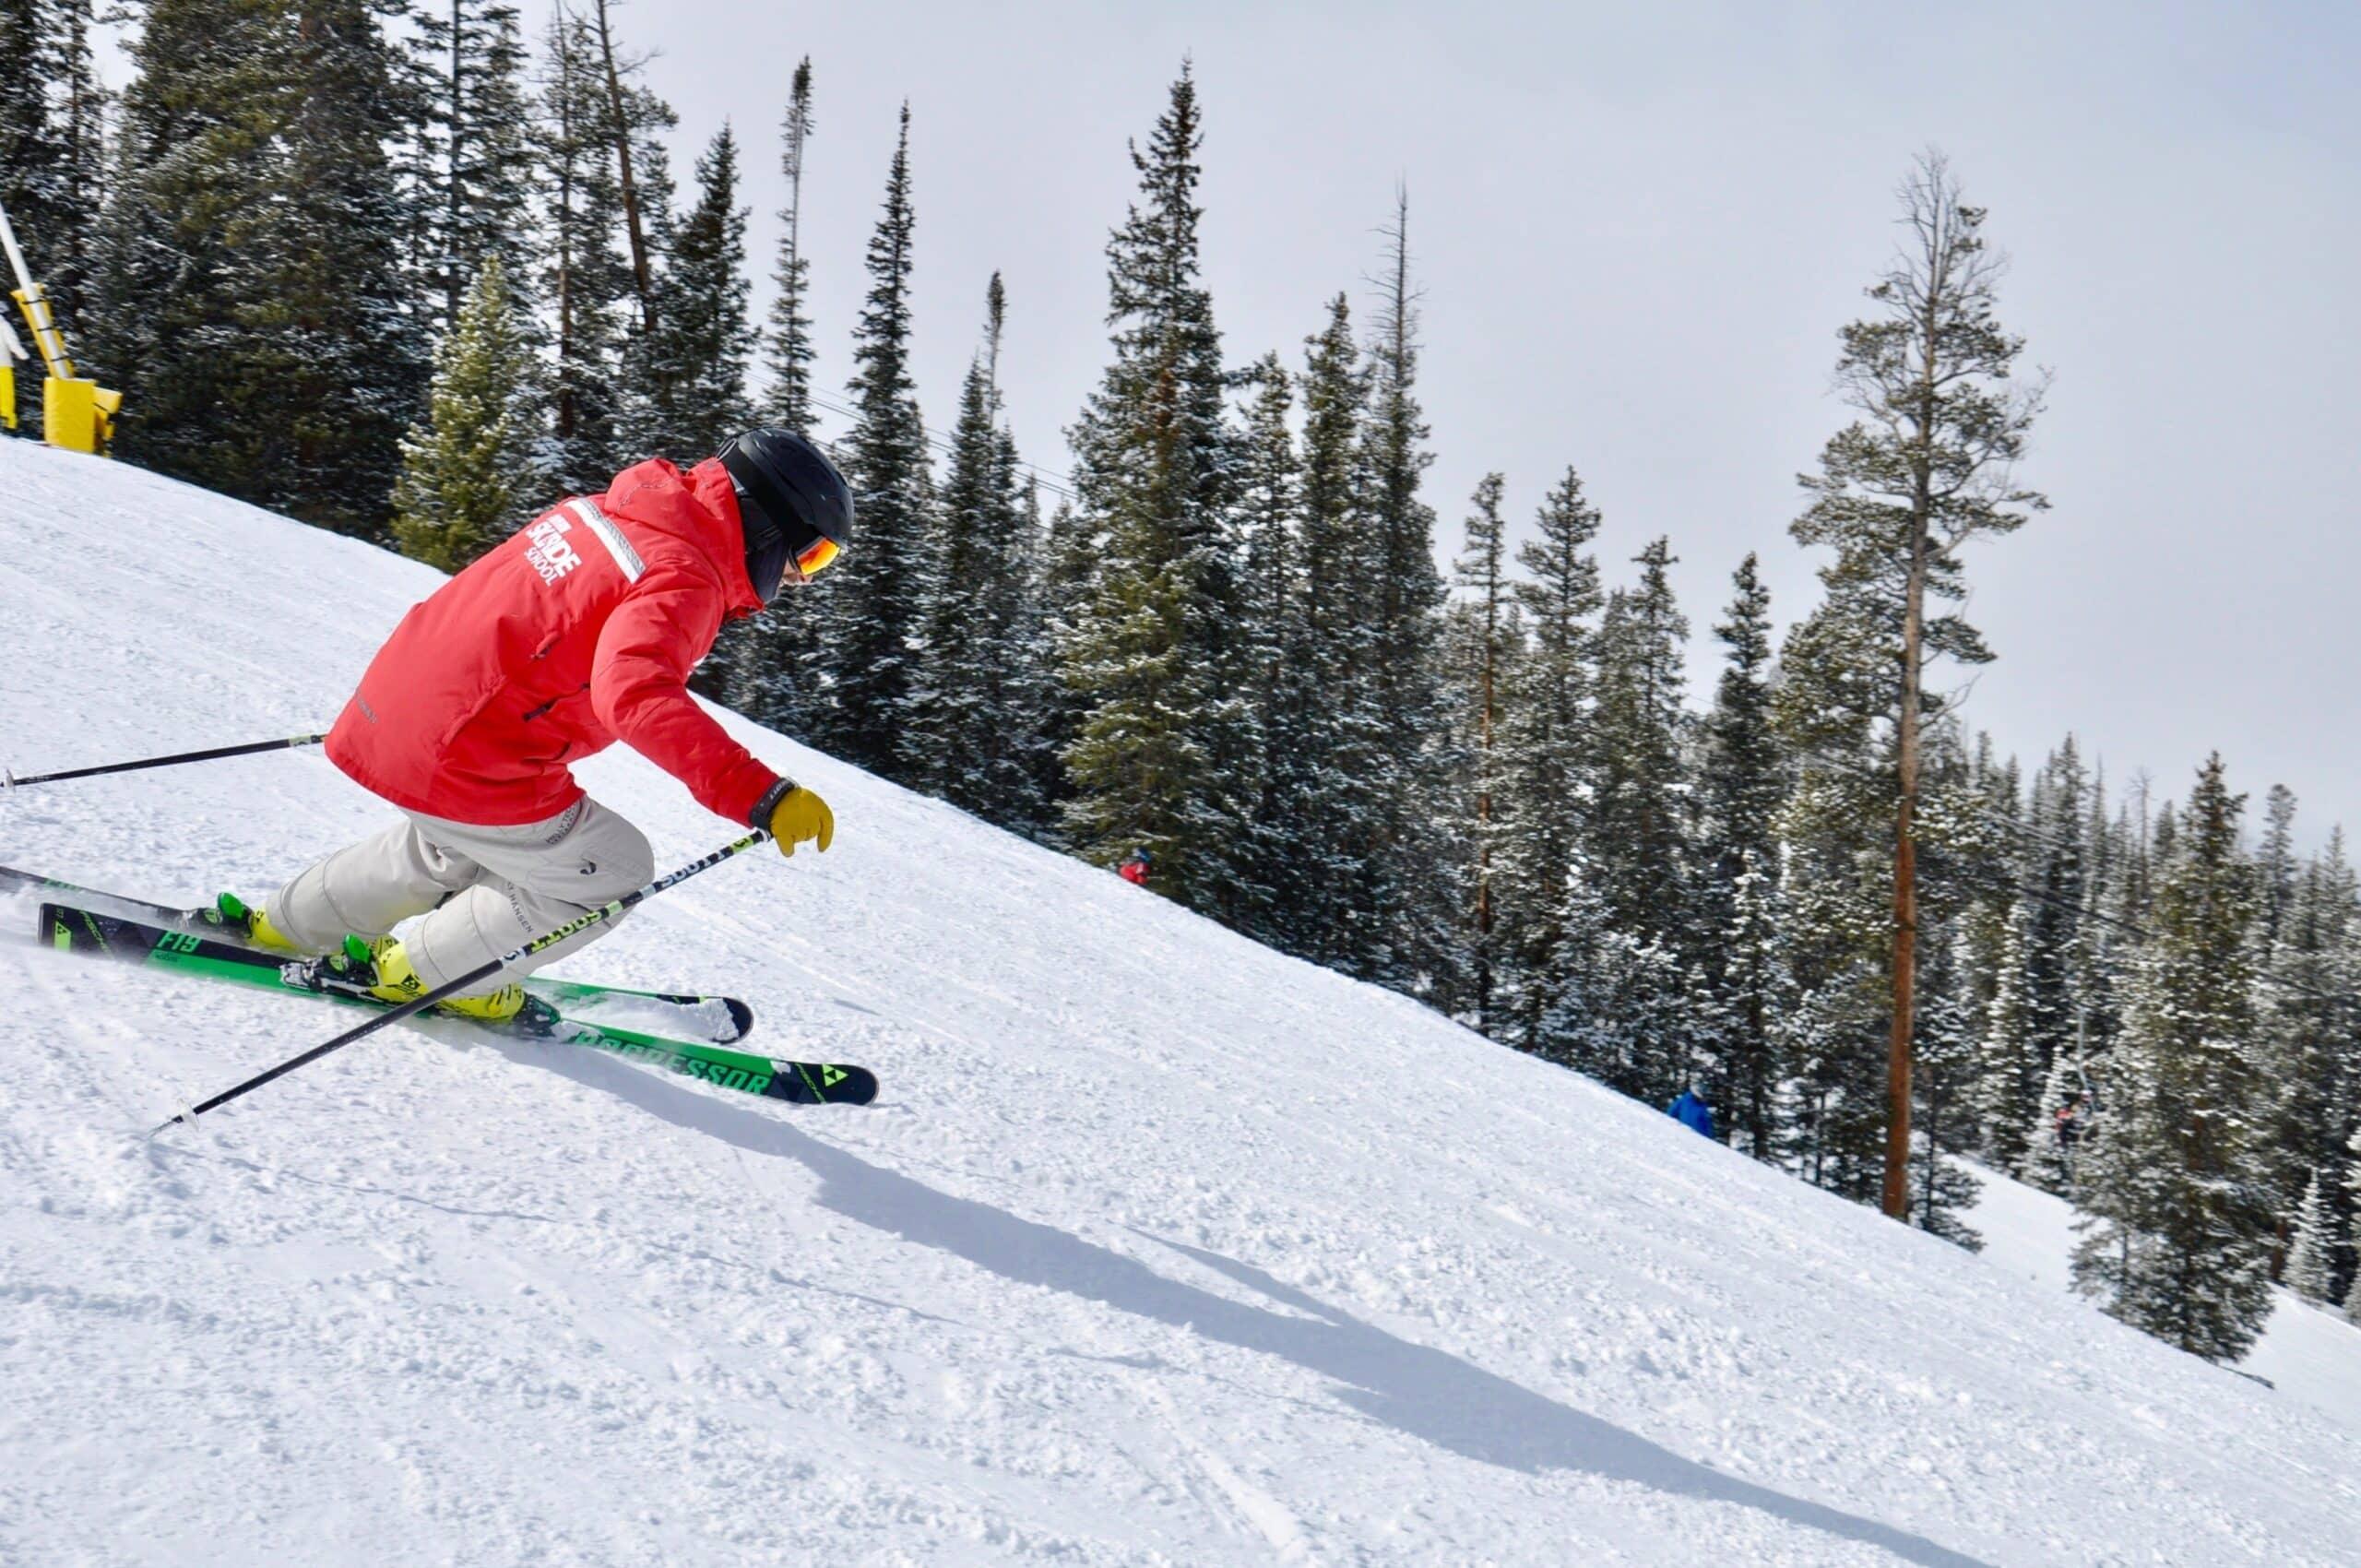 man with alternative ski waxed skis on